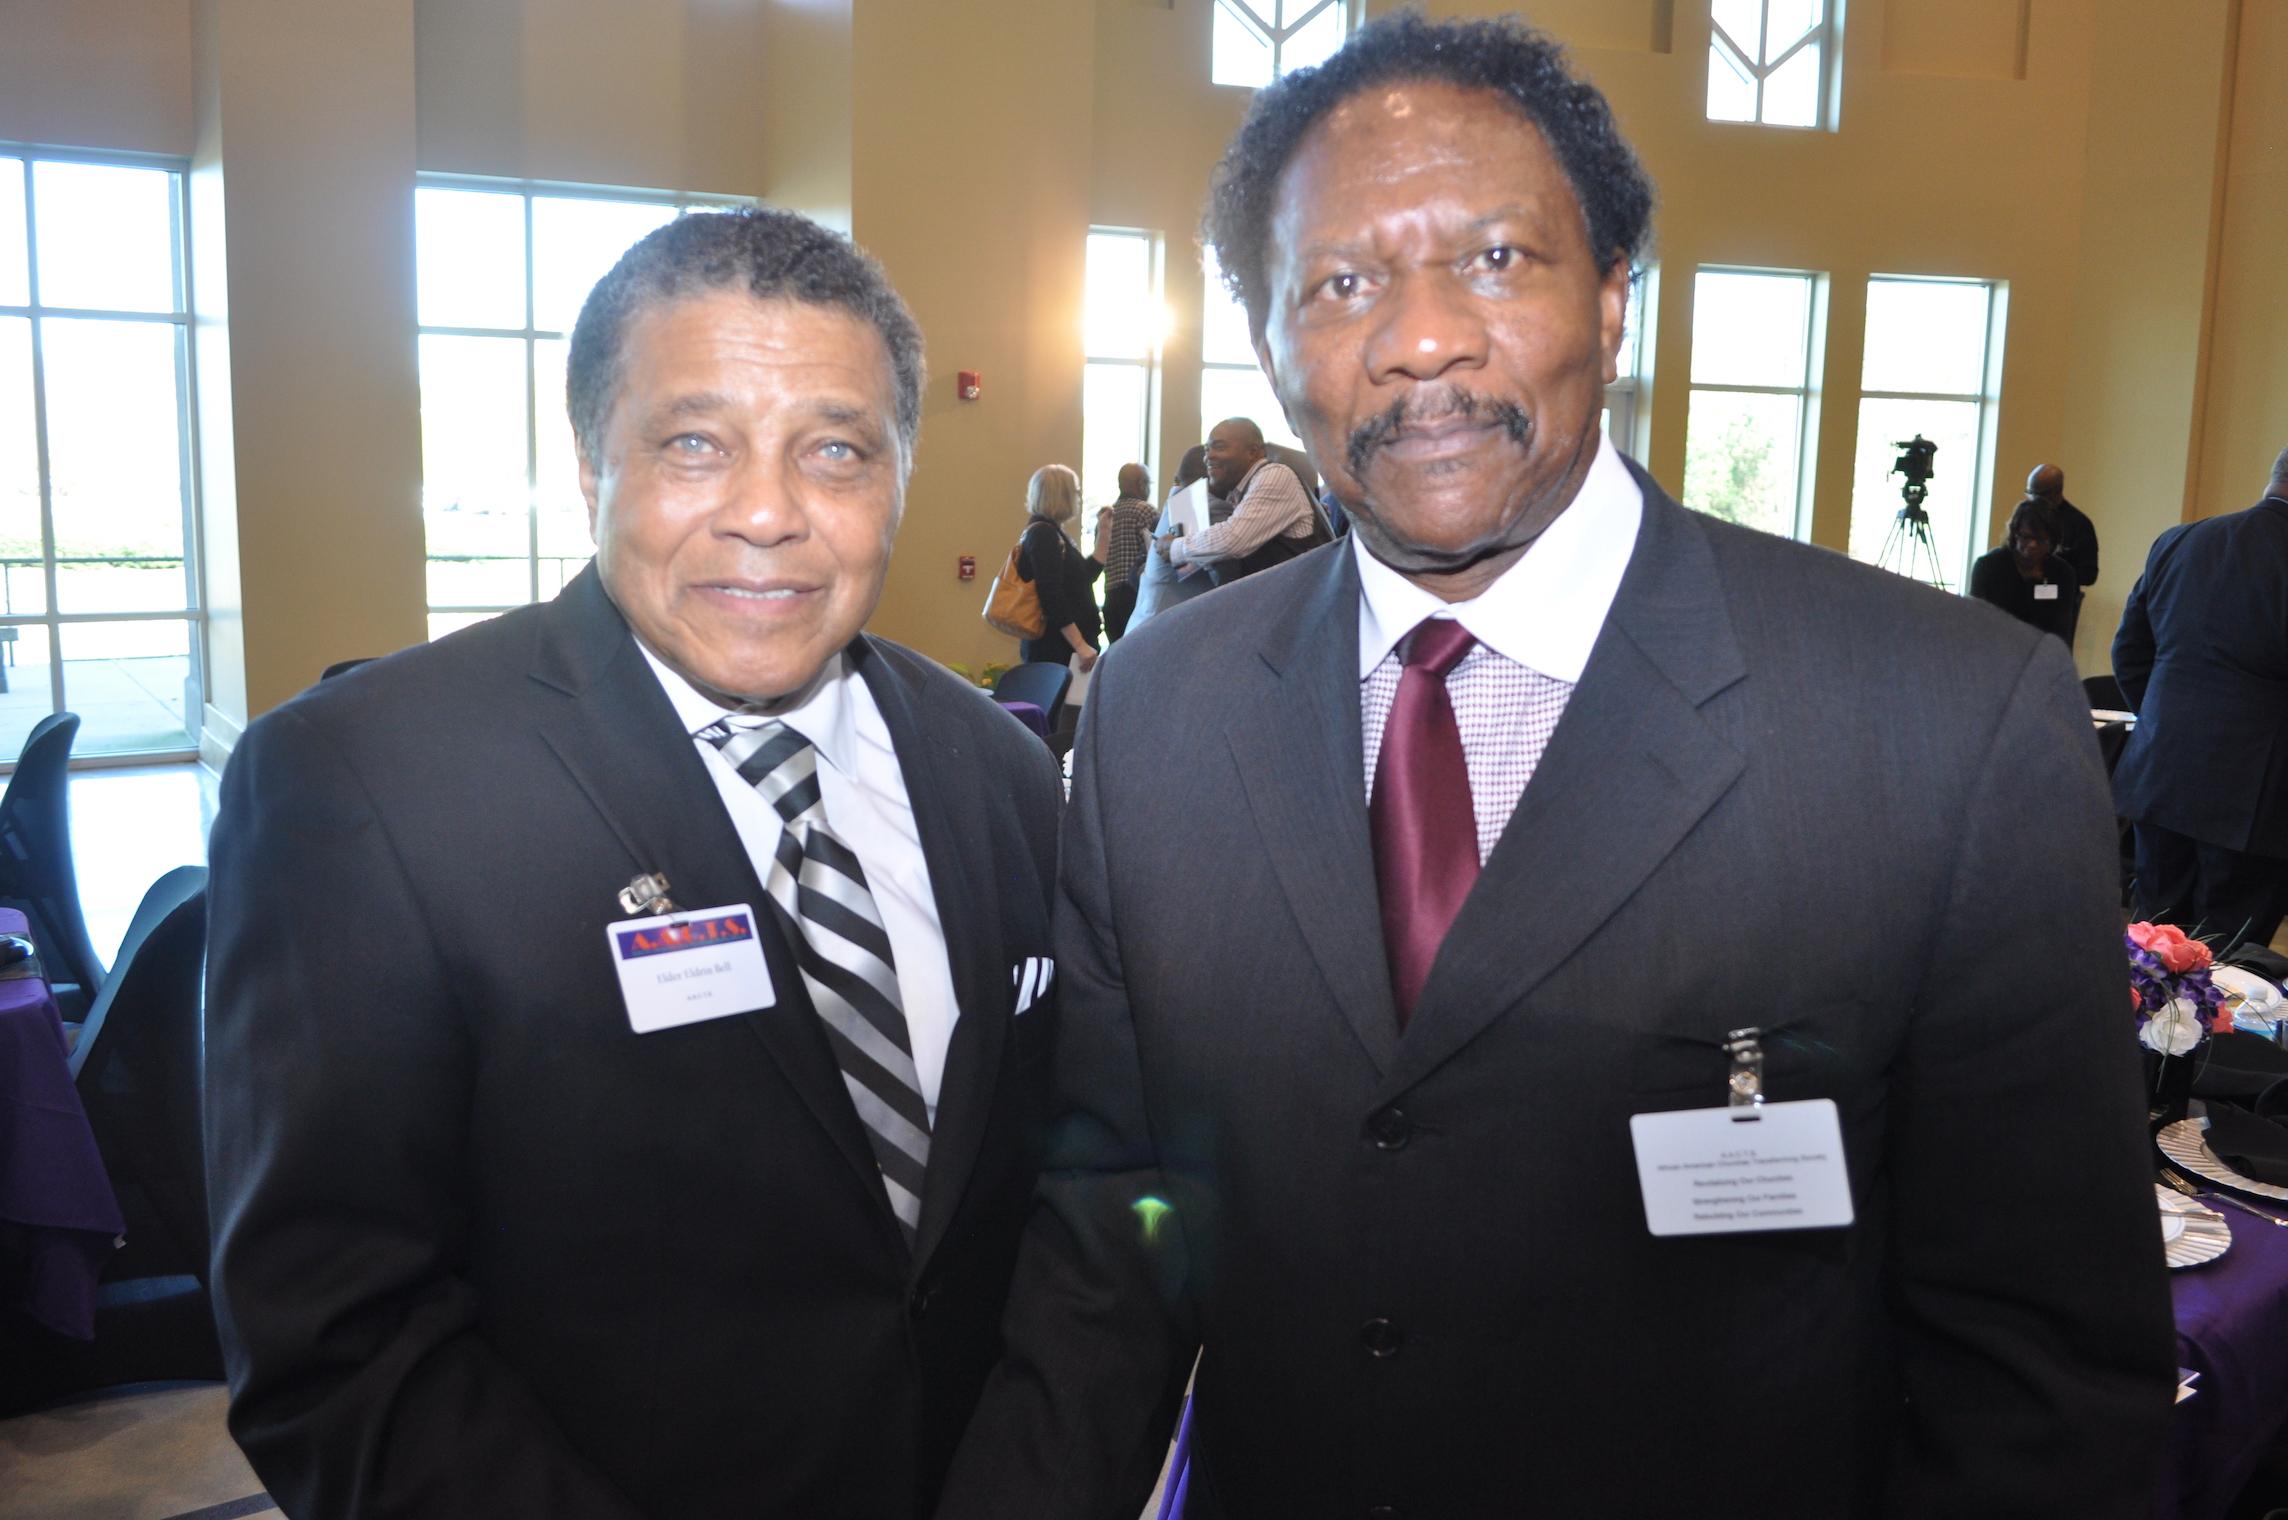 Clarence Callaway Educator Mentor Life Coach Atlanta_0021